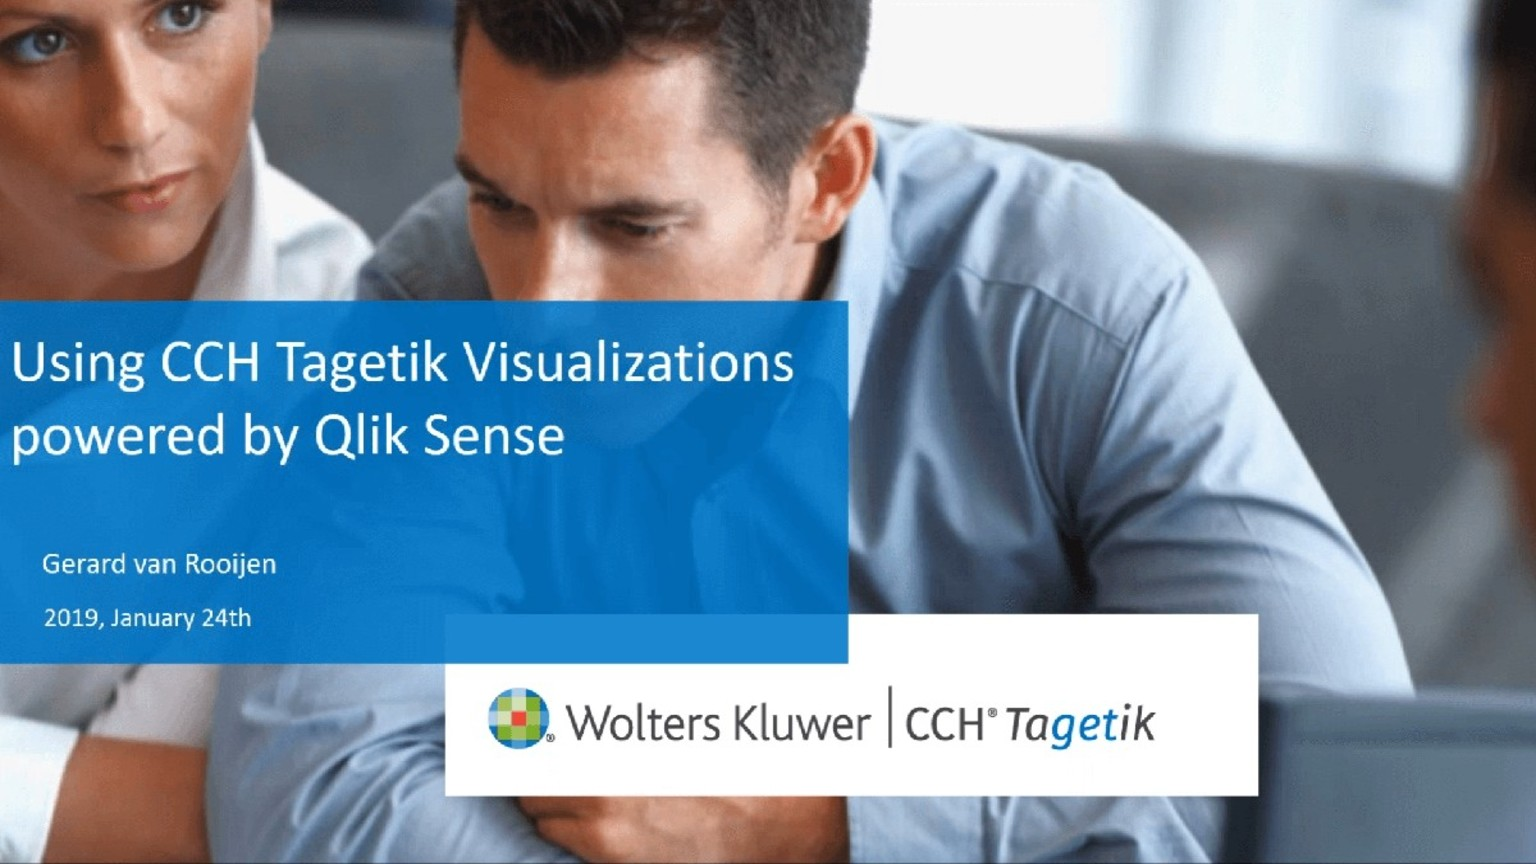 Using CCH Tagetik Visualizations Powered by Qlik Sense